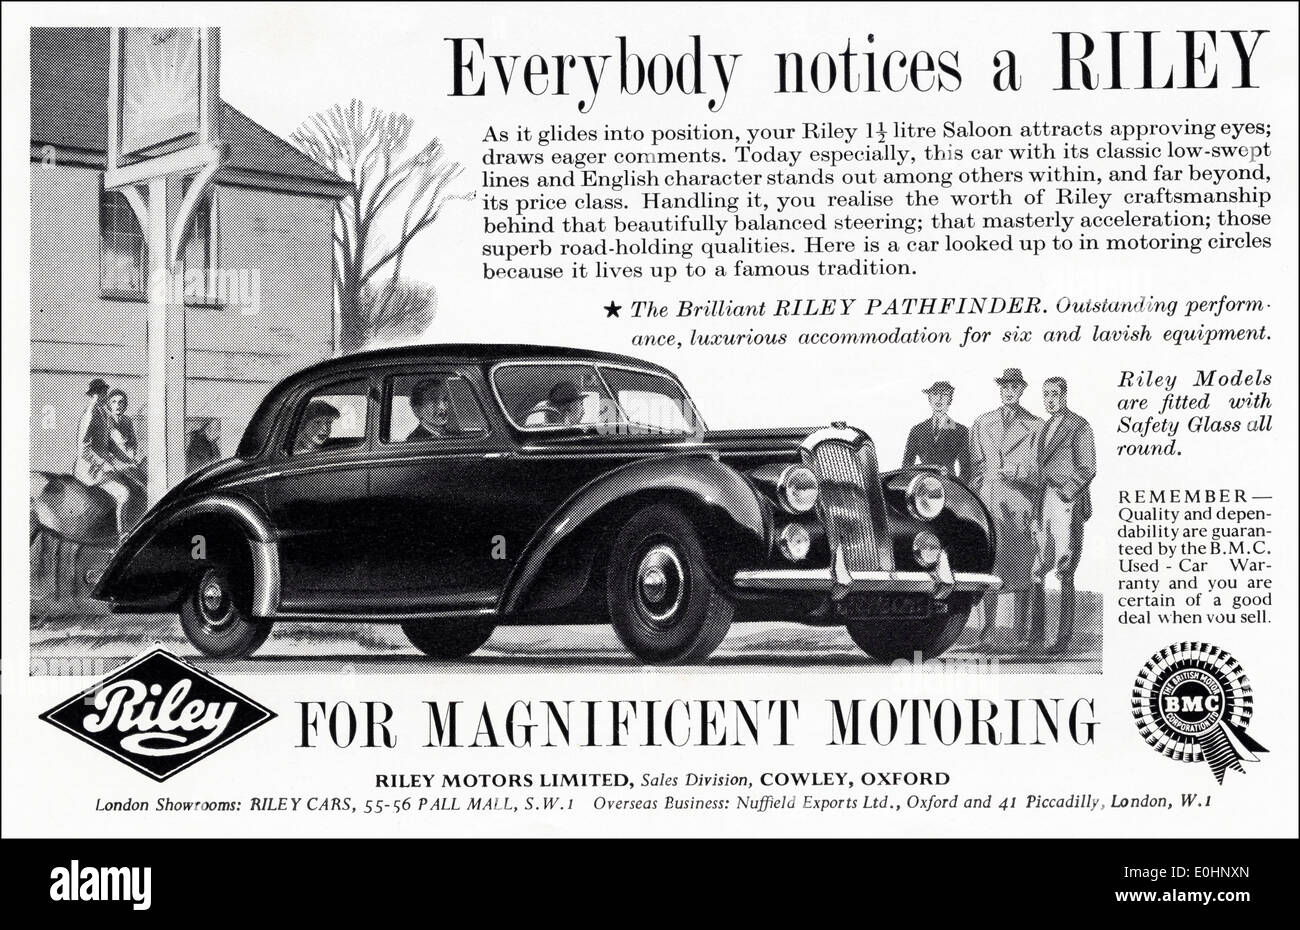 1950s British Car Advert Stock Photos & 1950s British Car Advert ...